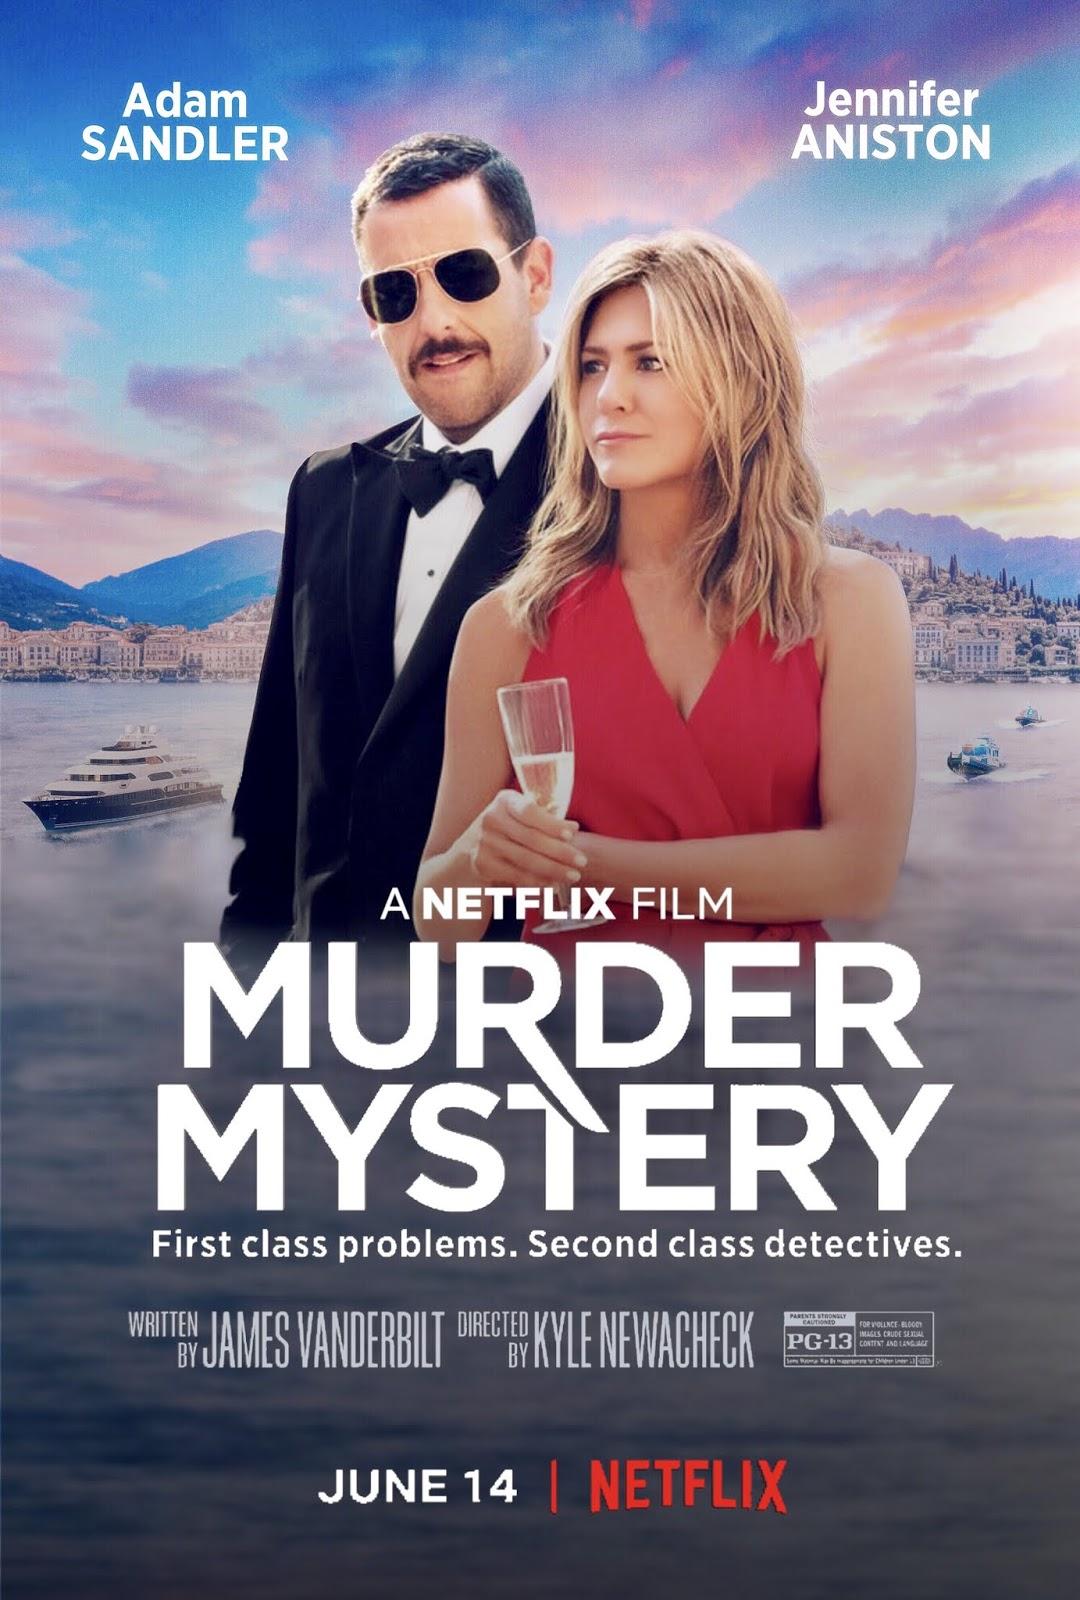 Mysteryfilme 2019